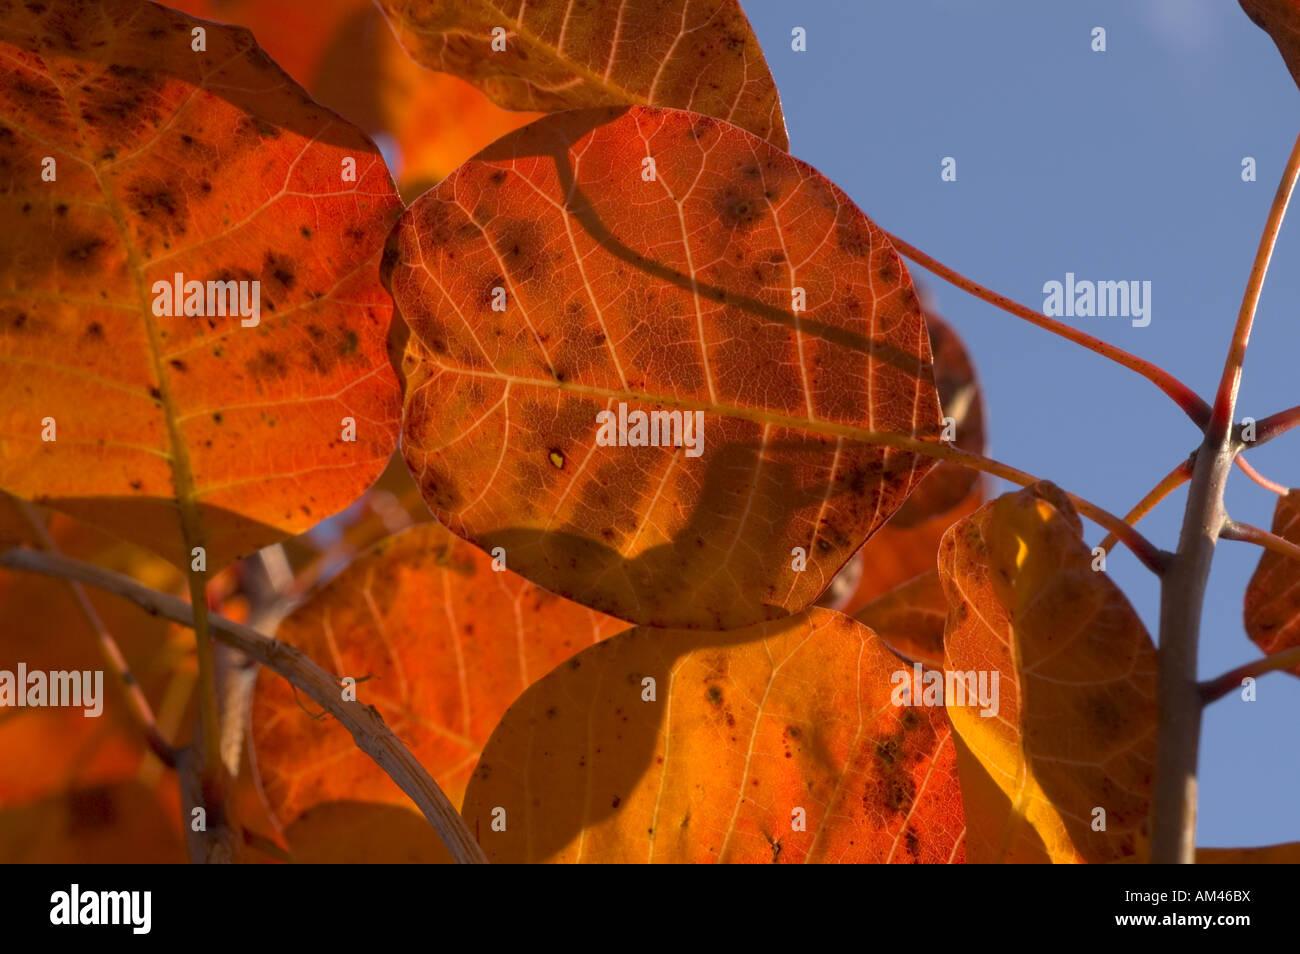 Autumn colours of Cotinus coggygria Smoke Bush. - Stock Image